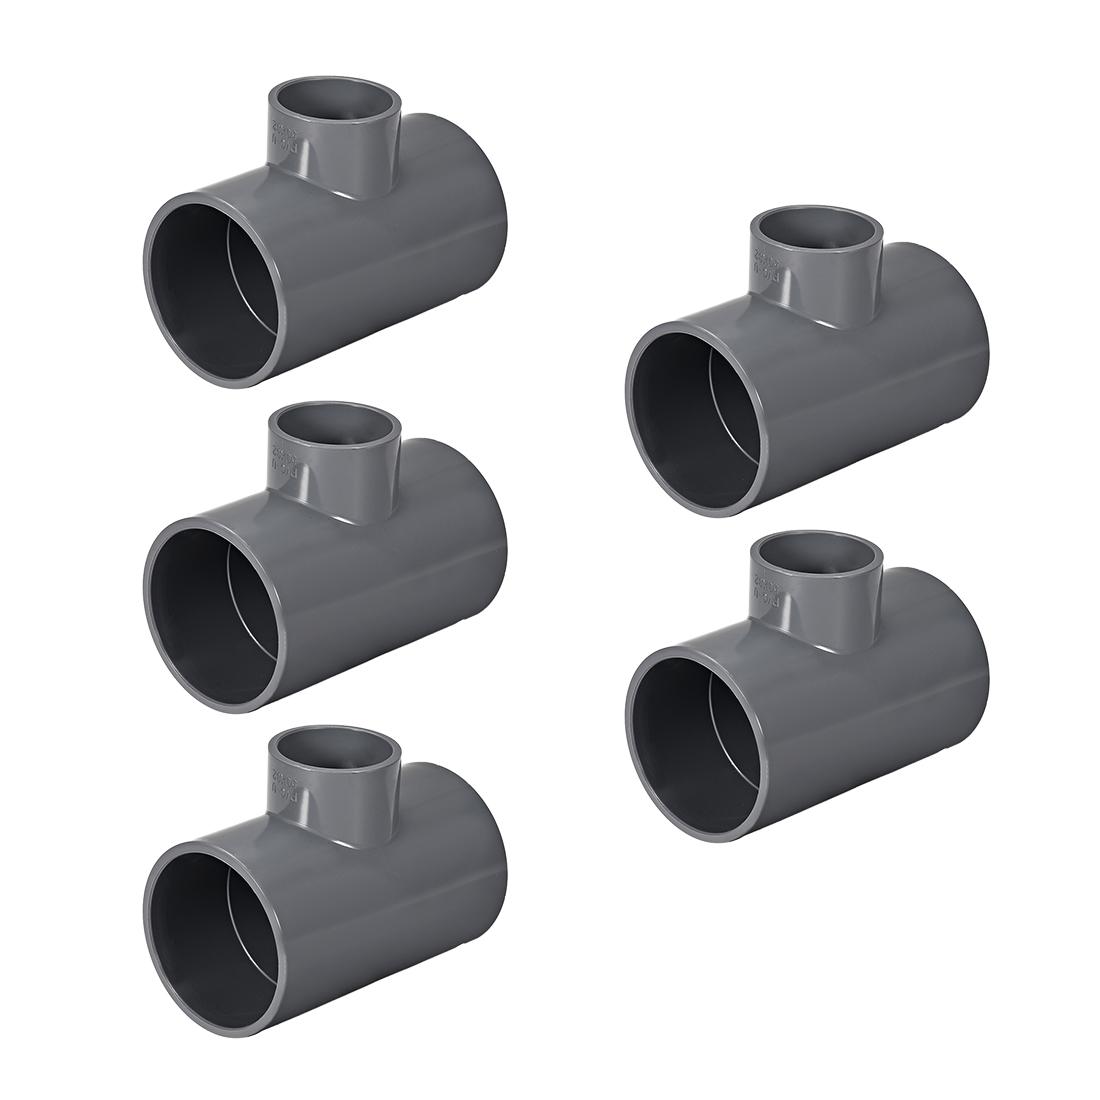 PVC Pipe Fitting Tee 401-Series Gray 2-inch X 1-1/4-inch Socket 5pcs